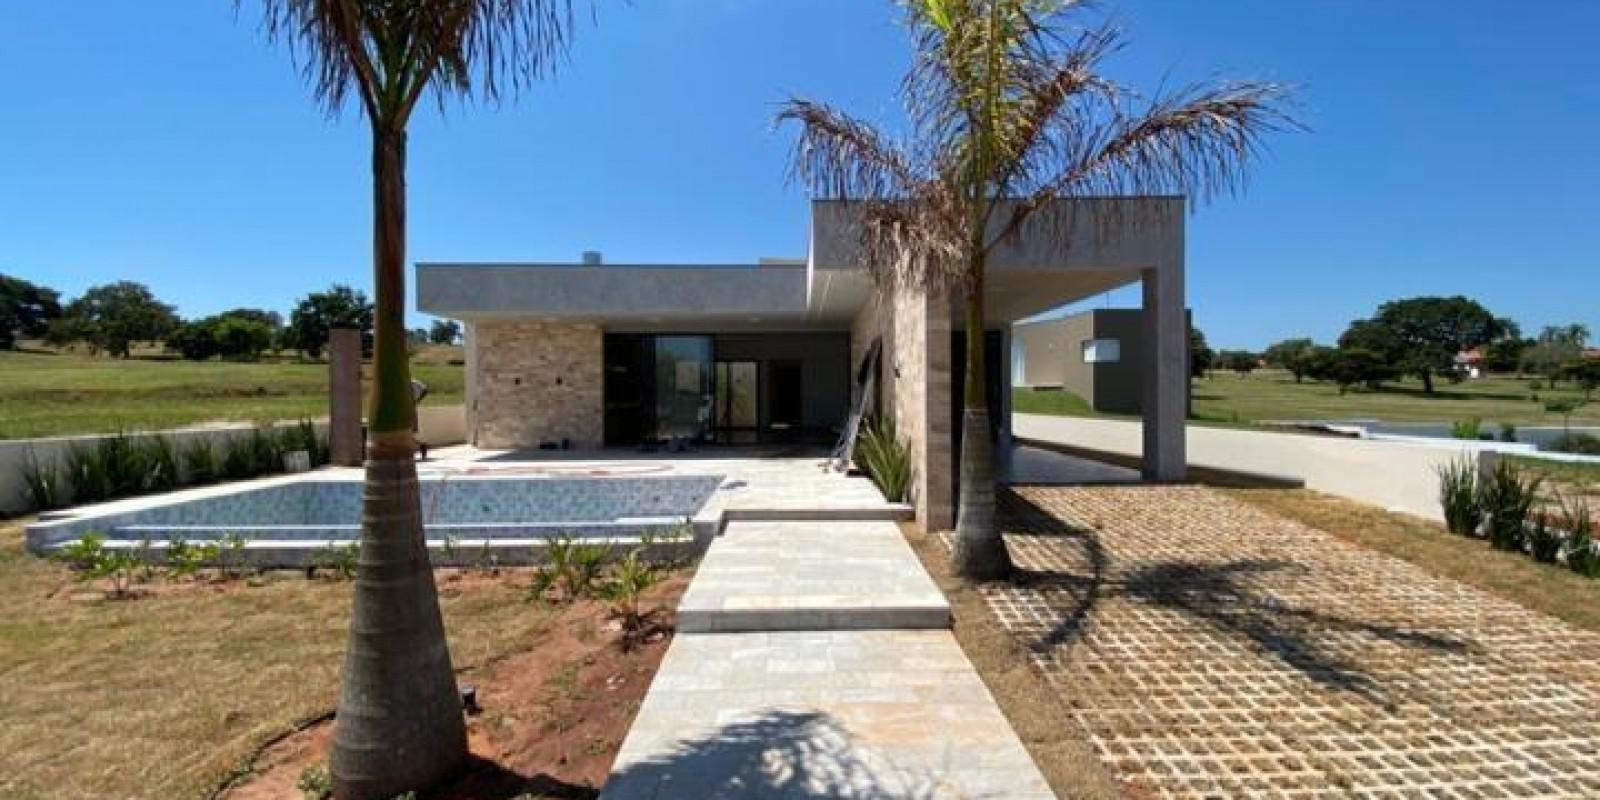 Casa na Represa no Condomínio Reviera de Sta Cristina XIII - Foto 20 de 25